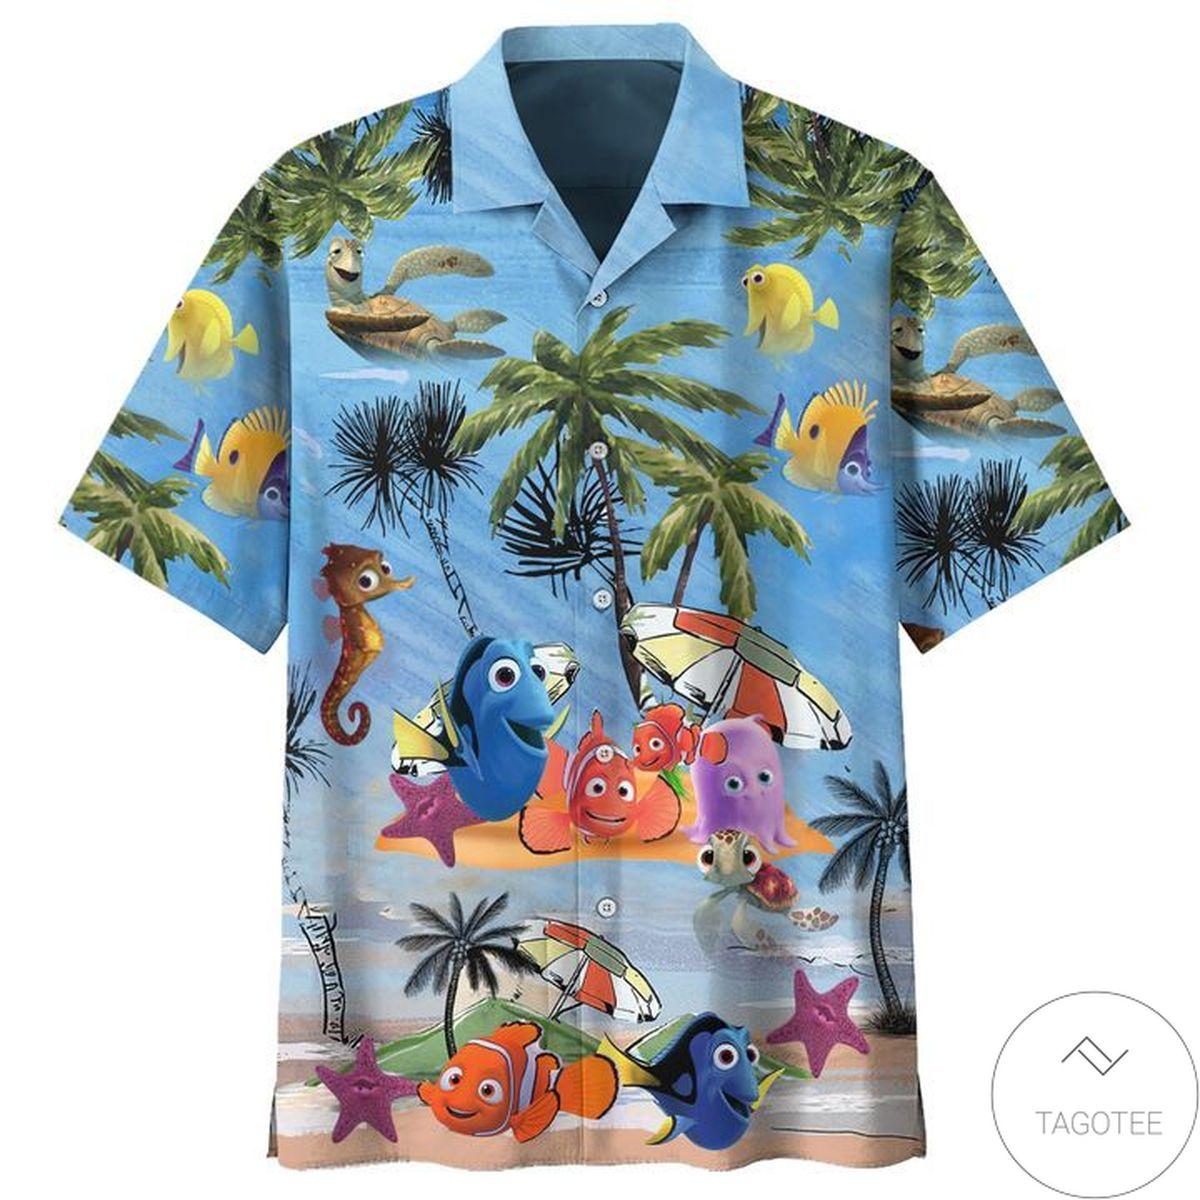 Finding Nemo Summer Vacation Cartoon Hawaiian Shirt